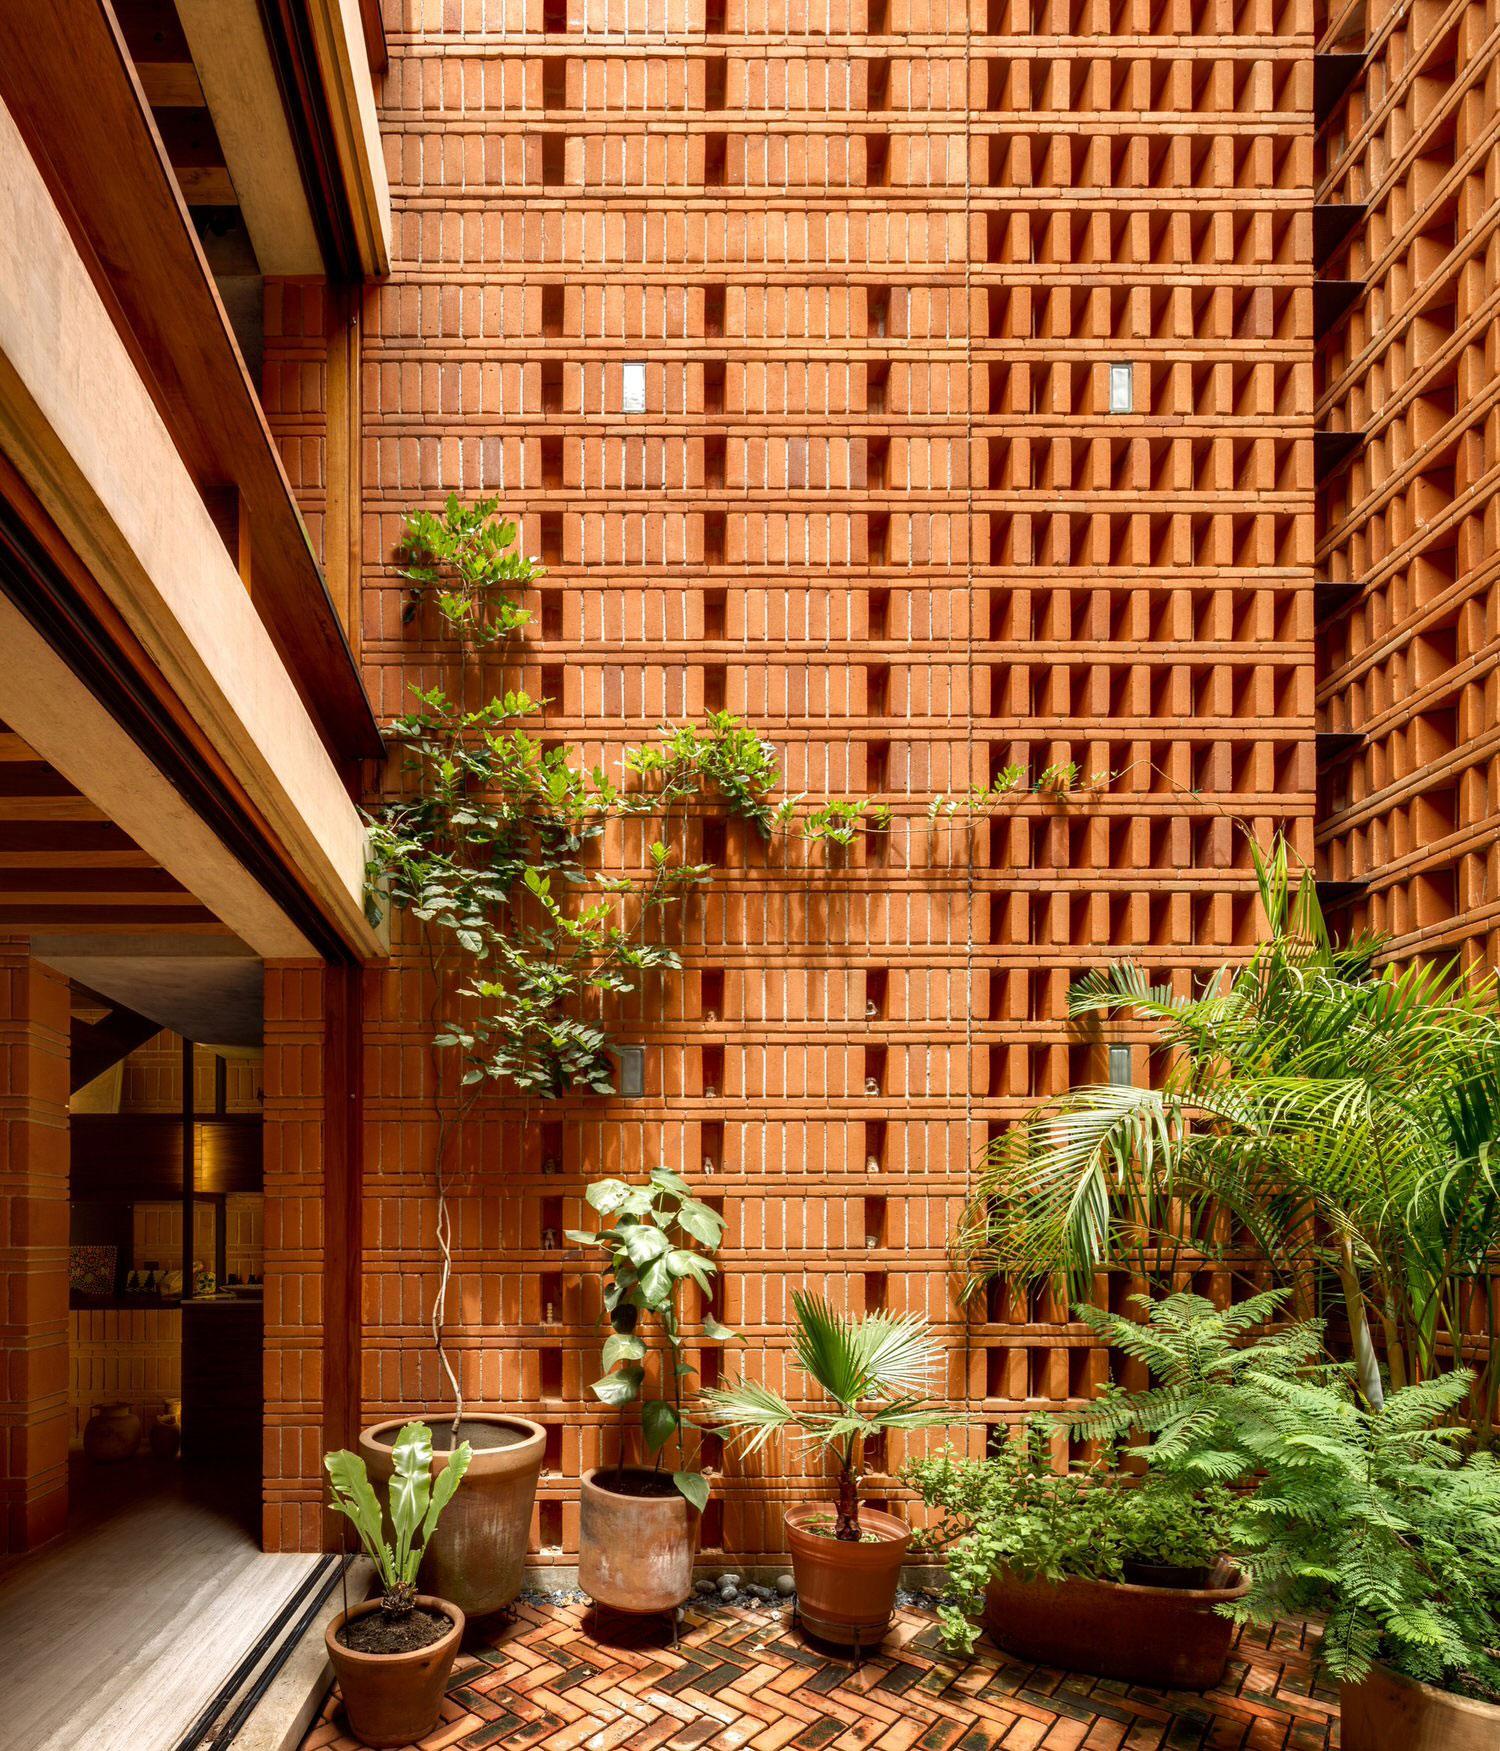 Iturbide Studio Mexico City Brick Architecture Taller Mauricio Rocha Gabriela Carrillo Yellowtrace 15